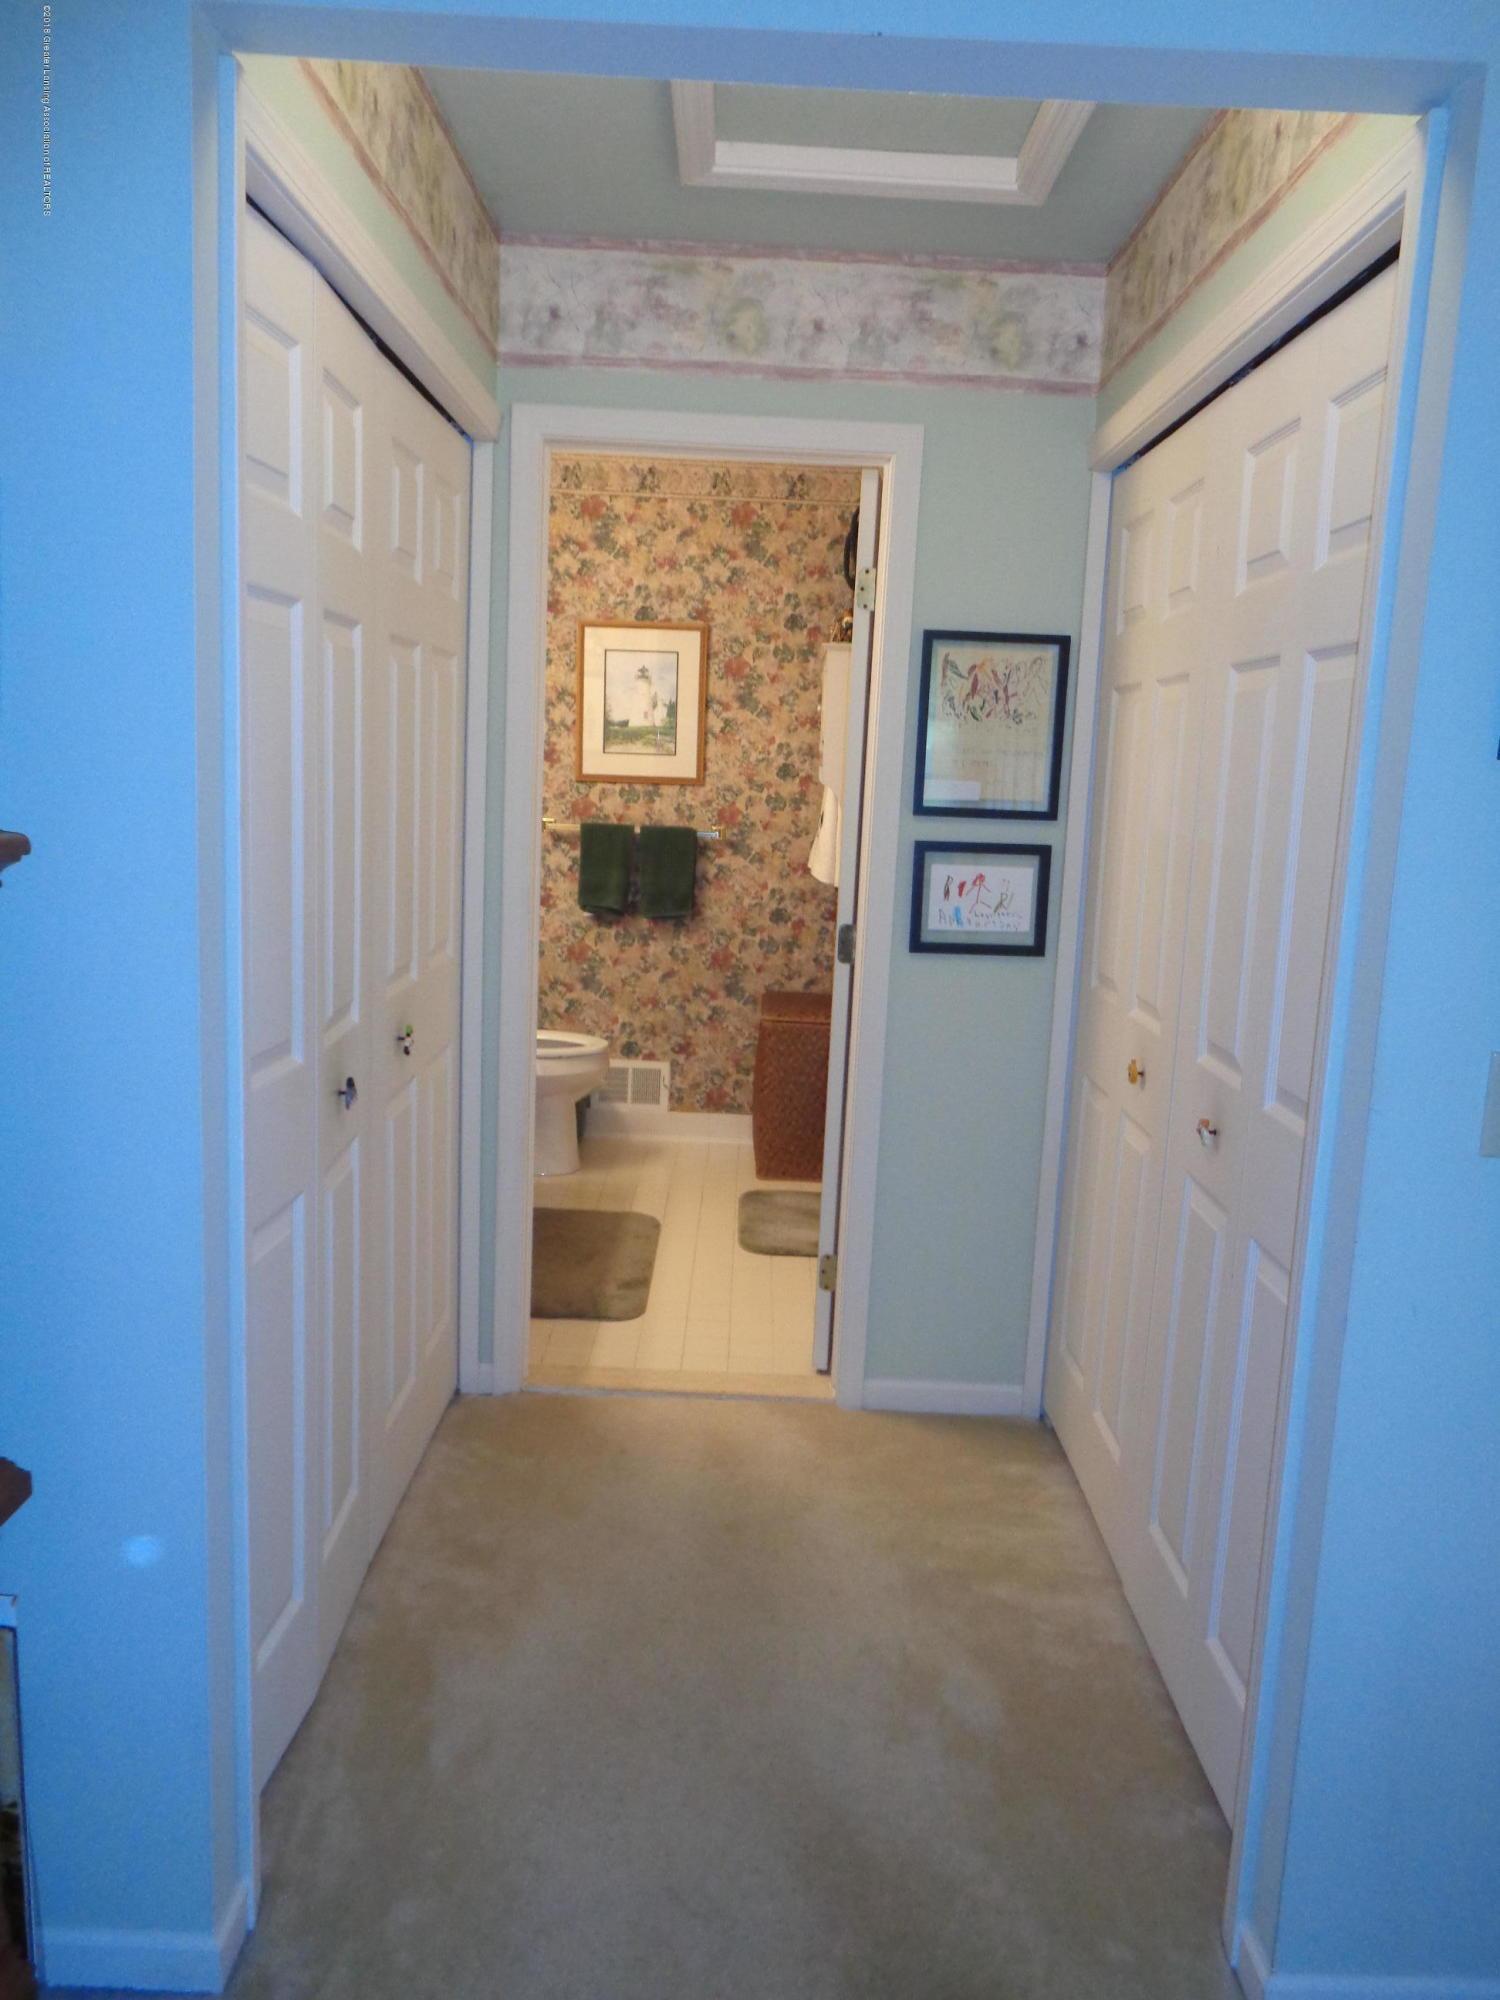 1205 Zimmer Pl Williamston, MI 48895 | Tomie Raines REALTORS